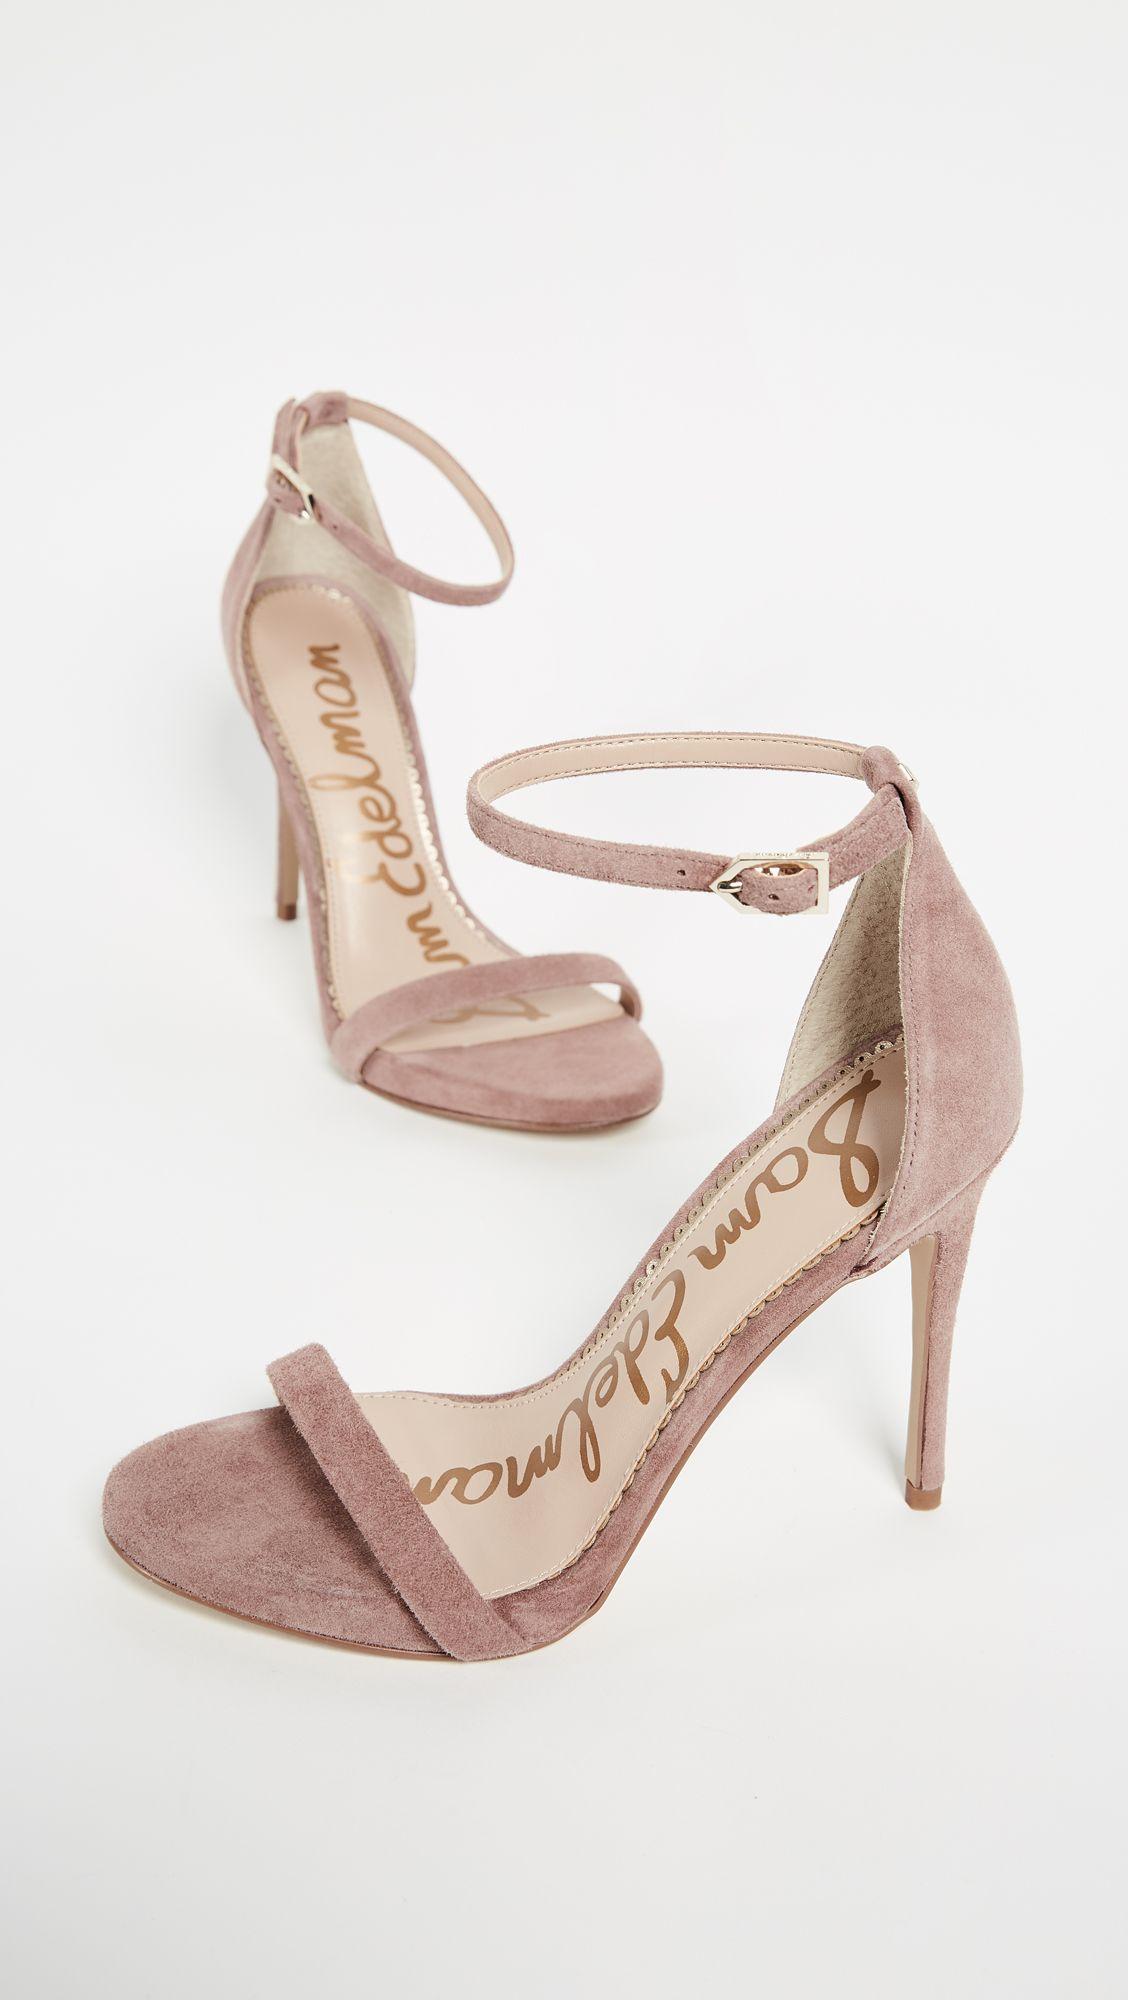 a744992cb Ariella Sandals   celebrate2018   Sandals, Shoes, Fashion